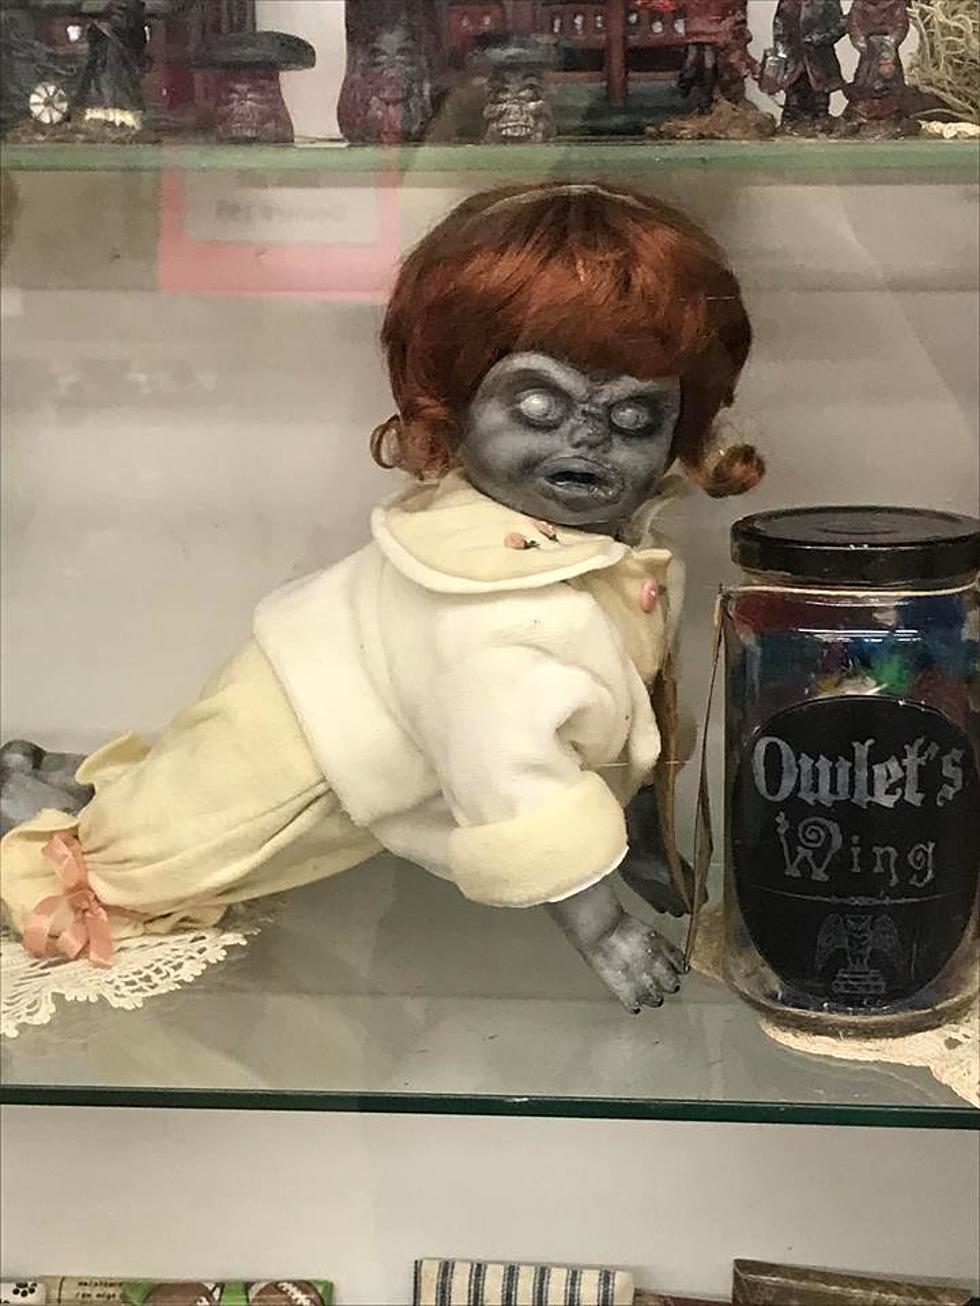 Diy Creepy Halloween Decorations.Diy Creepy Halloween Decorations With Dolls